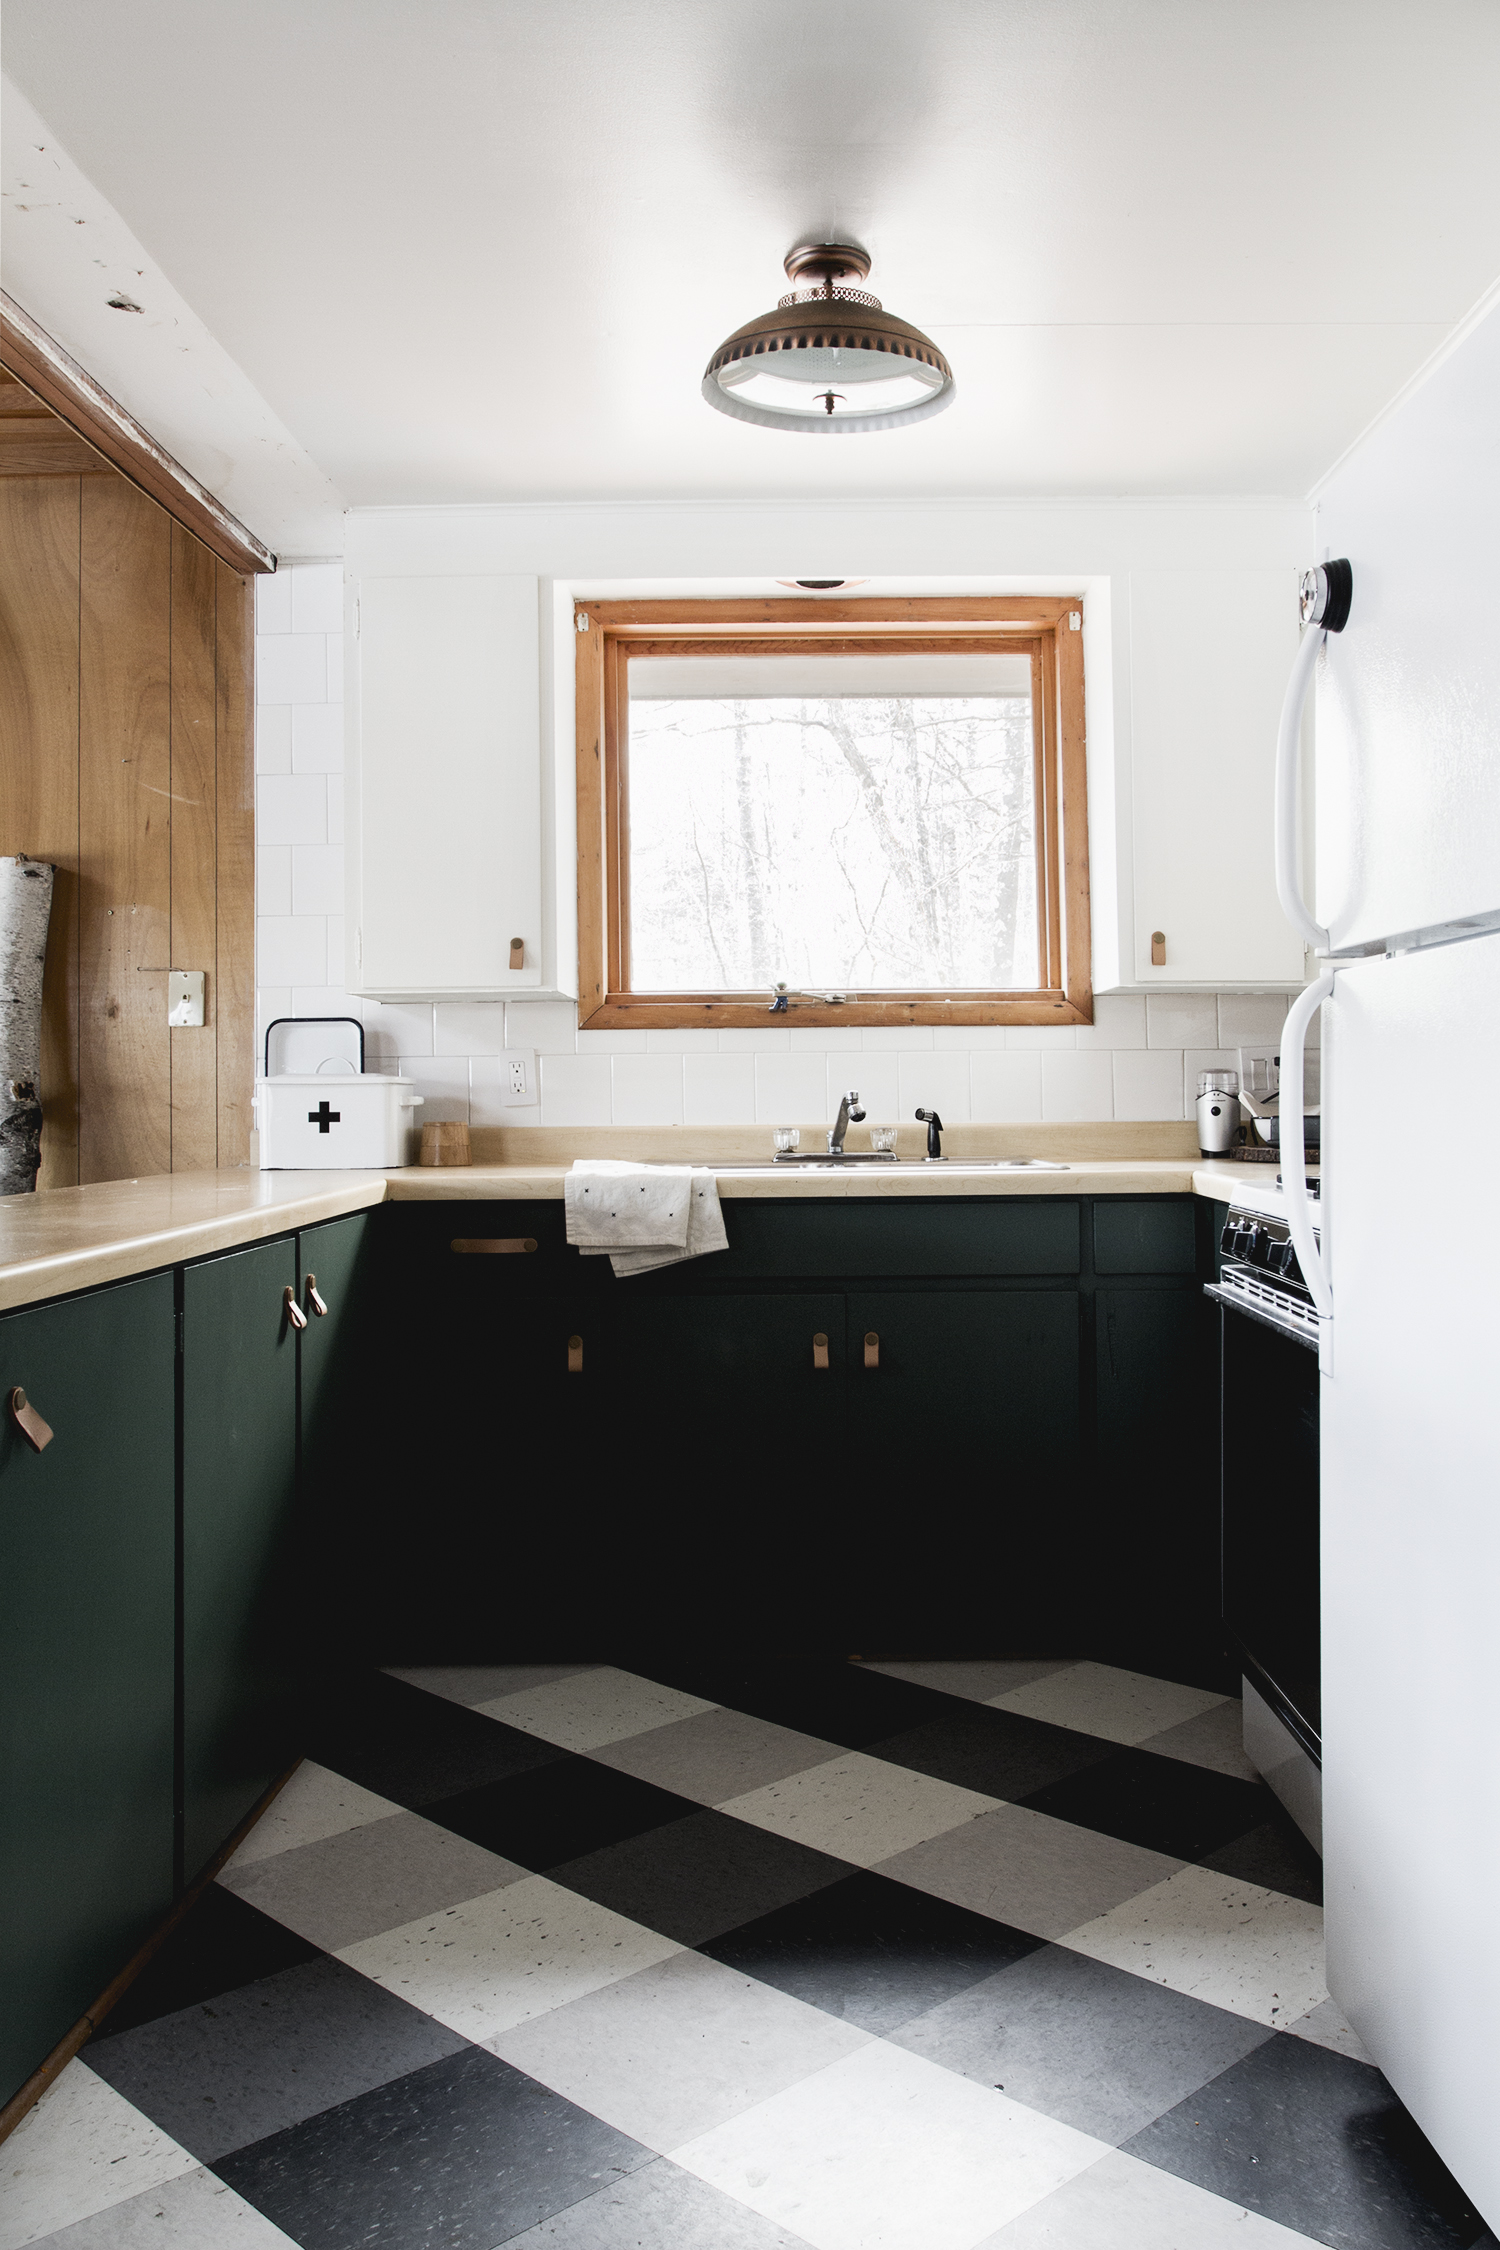 Updating our Vintage Cabin Kitchen // Deuce Cities Henhouse